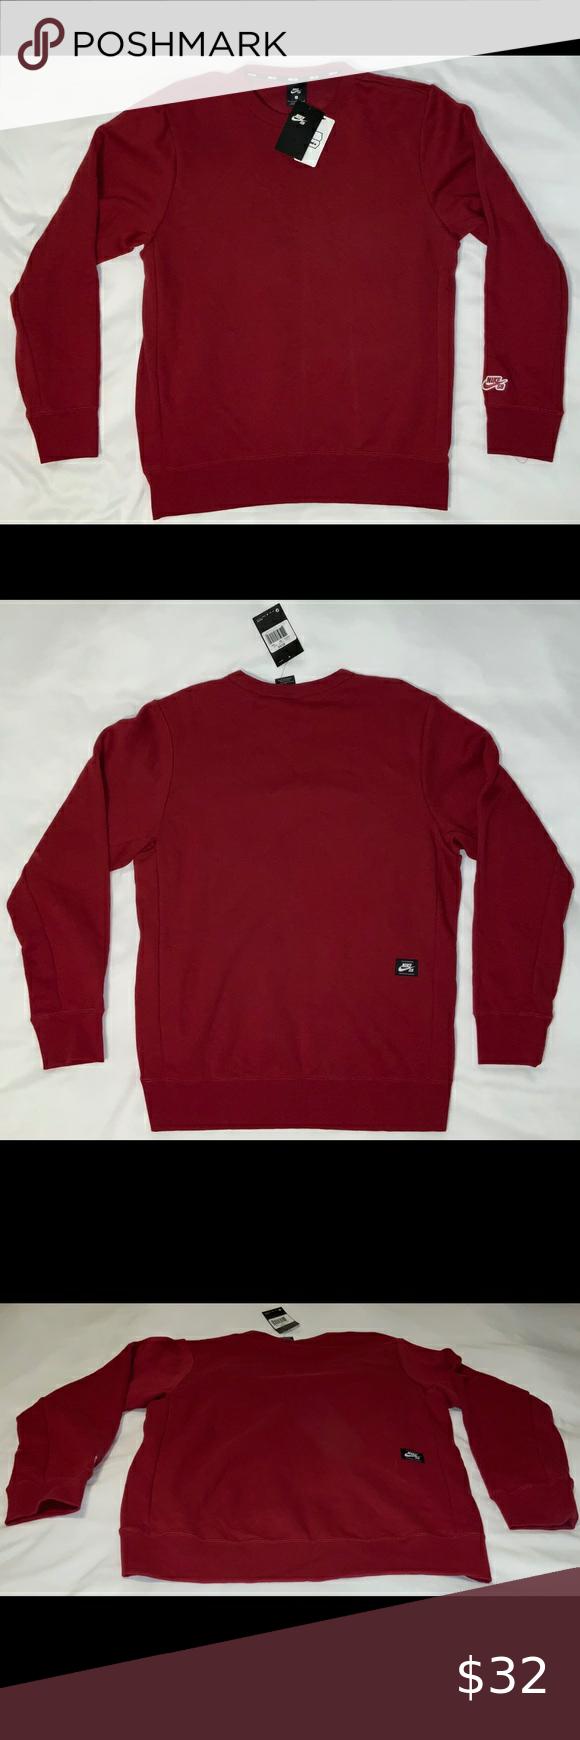 Predownload: Nike Sb Red Crewneck Sweatshirt Large Nike Sb Crewneck Sweatshirt Size Large Color Red Condition New Wi Long Sleeve Tshirt Men Sweatshirt Shirt Red Crewneck [ 1740 x 580 Pixel ]